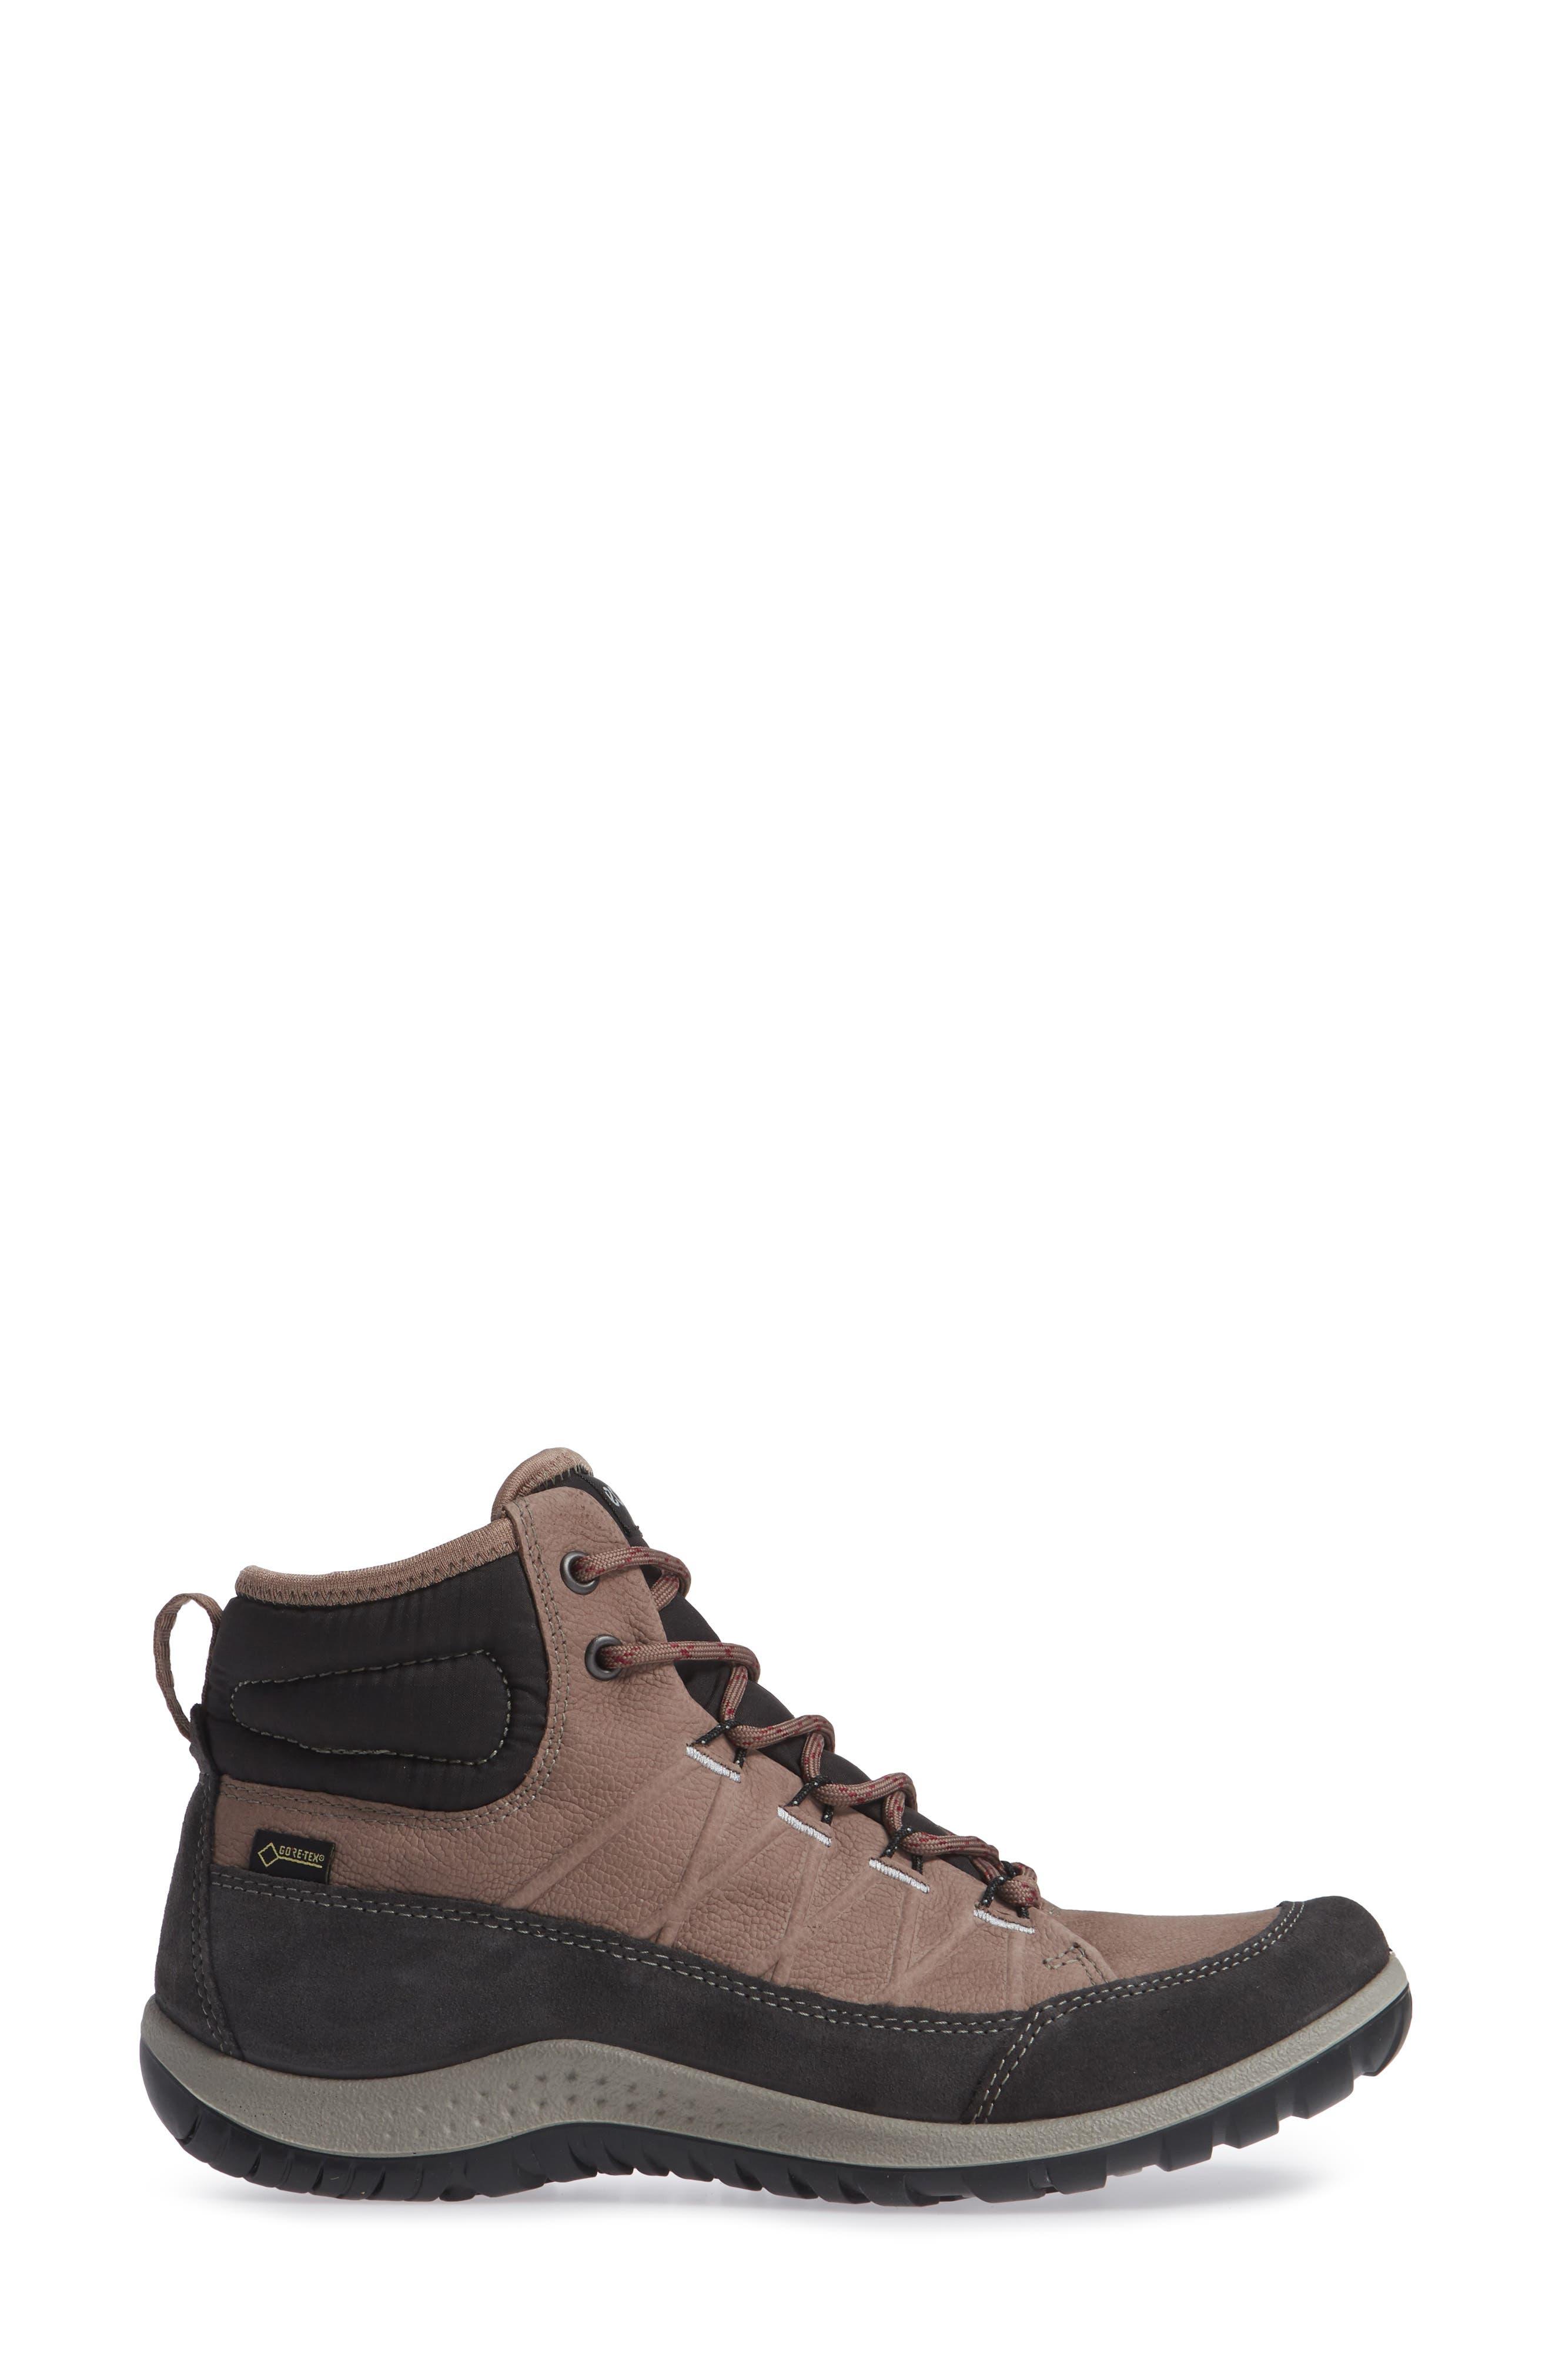 ECCO, 'Aspina GTX' Waterproof High Top Shoe, Alternate thumbnail 3, color, DEEP TAUPE NUBUCK LEATHER